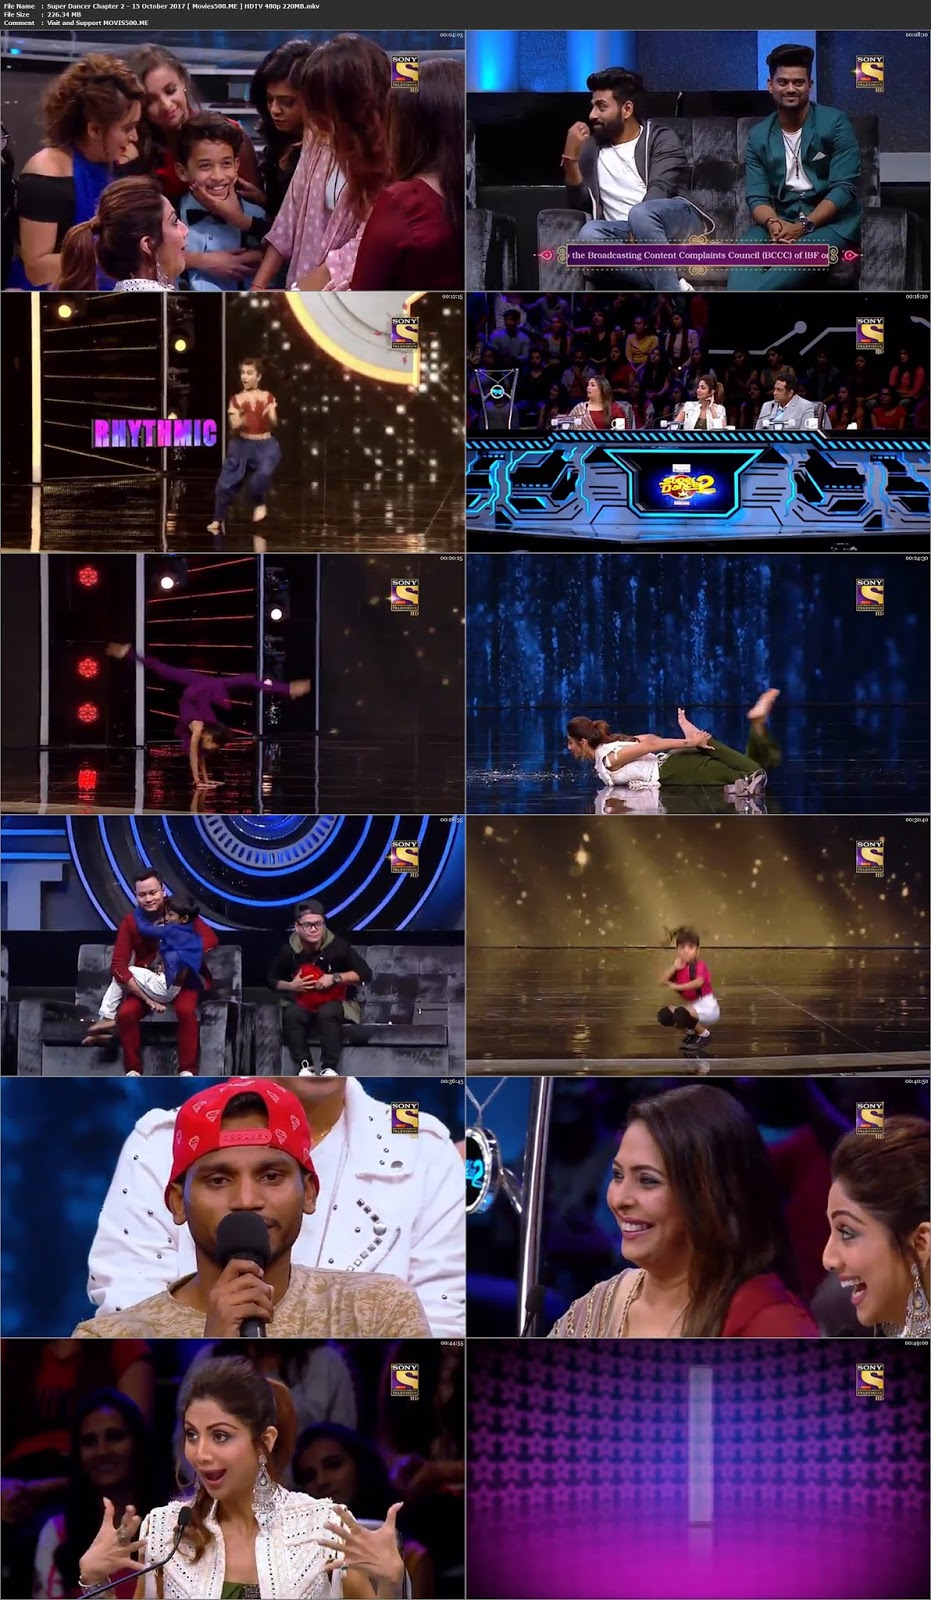 Super Dancer Chapter 2 2017 15 October 226MB HDTV 480p at lucysdoggrooming.com